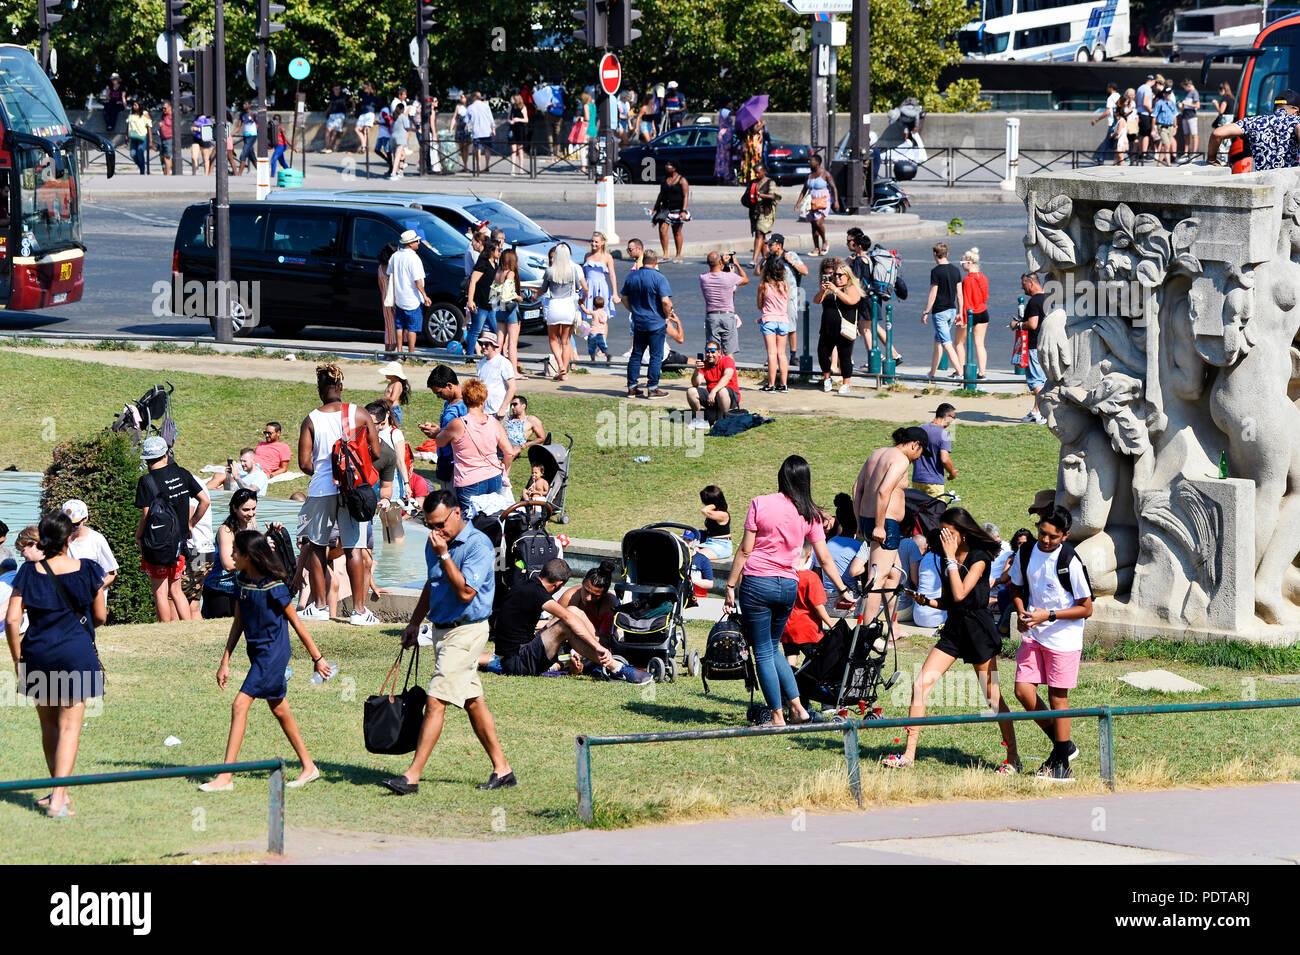 Heat wave in Paris - Trocadéro - Paris - France - Stock Image